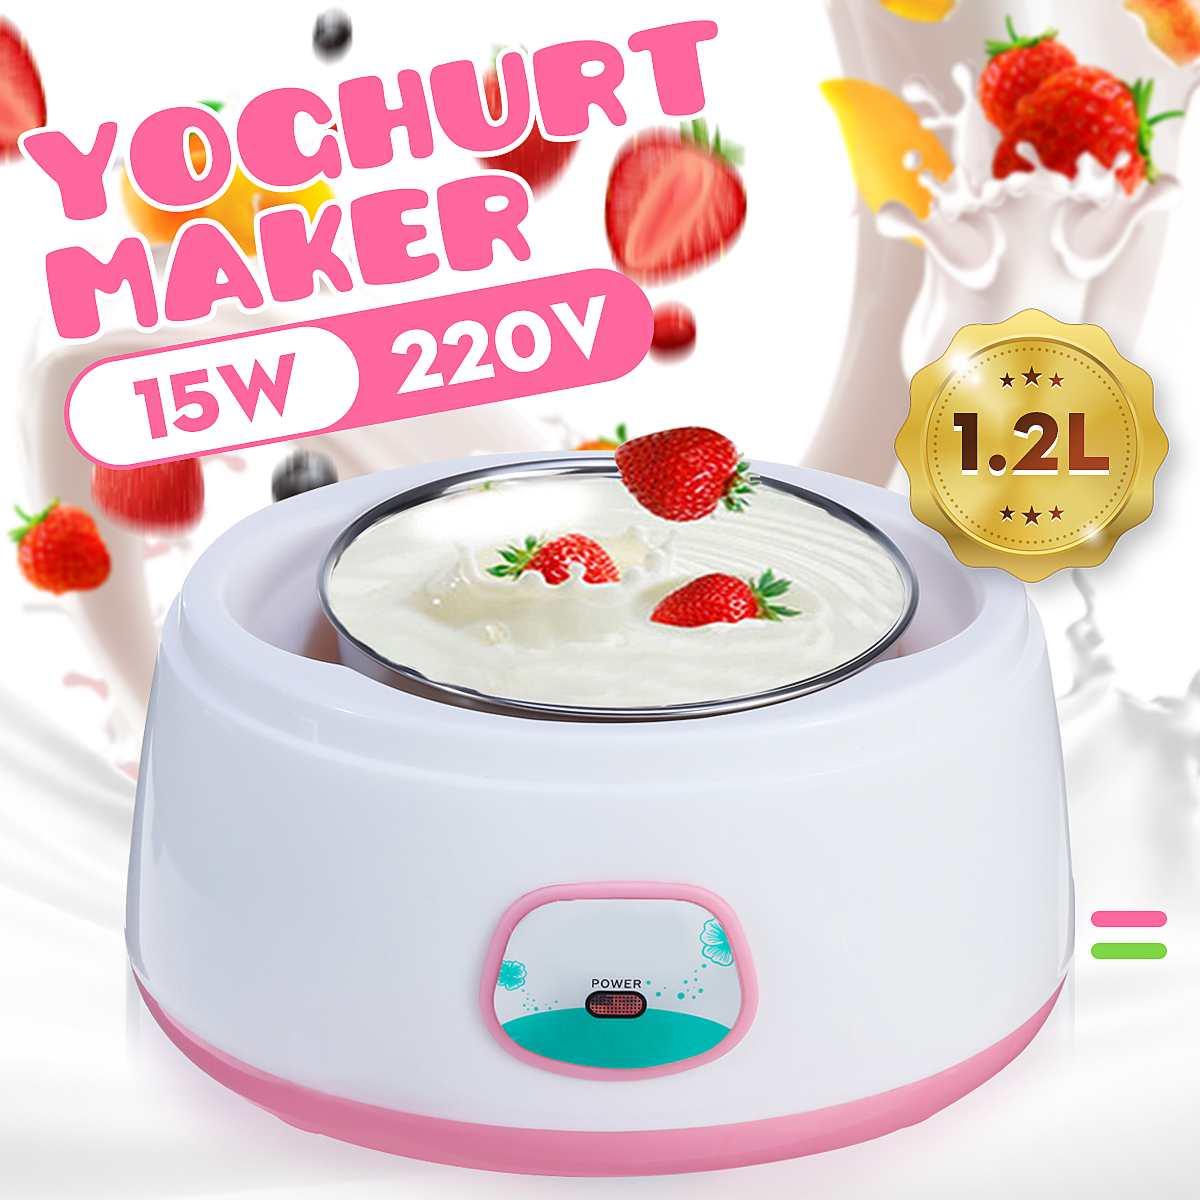 220V Yogurt Makers 1.2L Full Automatic Yogurt Machine Maker Household Stainless Steel/PP DIY Yogurt tools Mini Kitchen appliance